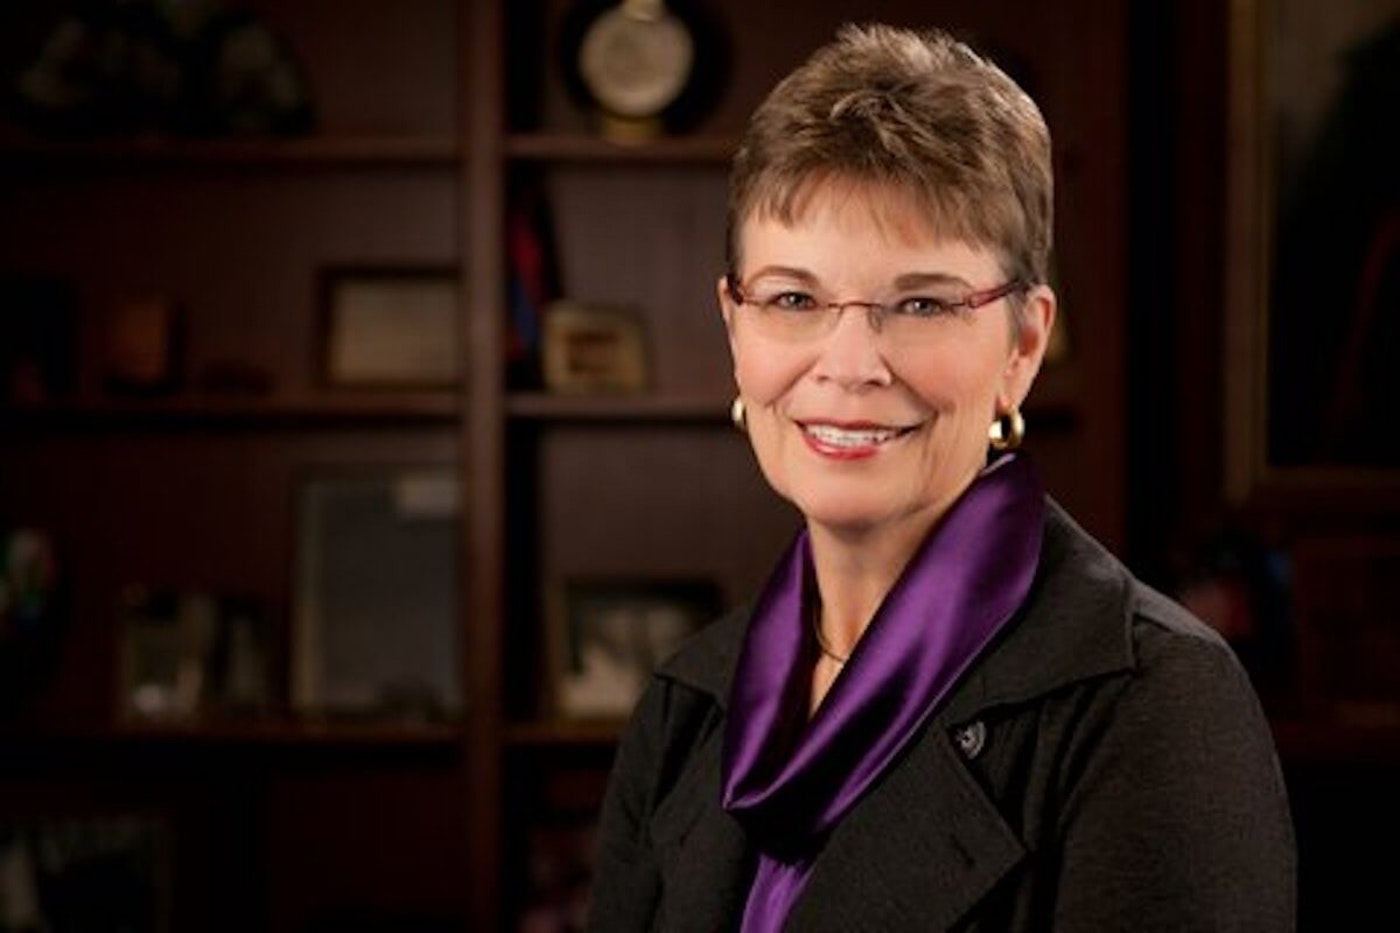 Nancy Sharts-Hopko, Ph.D., RN, FAAN, is a professor in the Fitzpatrick College of Nursing at Villanova University, Villanova, Pennsylvania. (Courtesy of Villanova University)